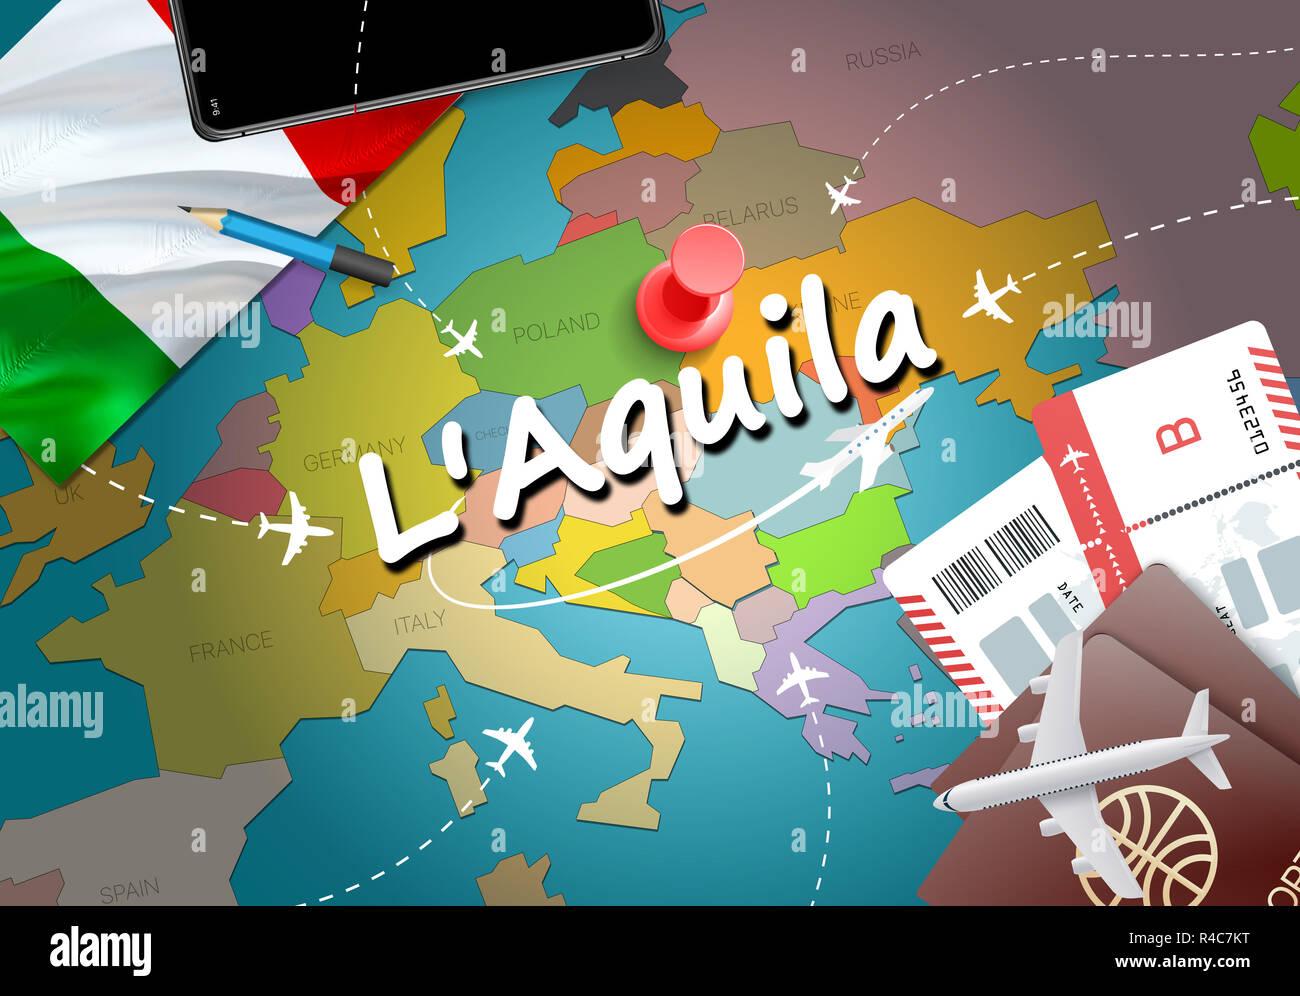 Aquila Italy Map.L Aquila City Travel And Tourism Destination Concept Italy Flag And